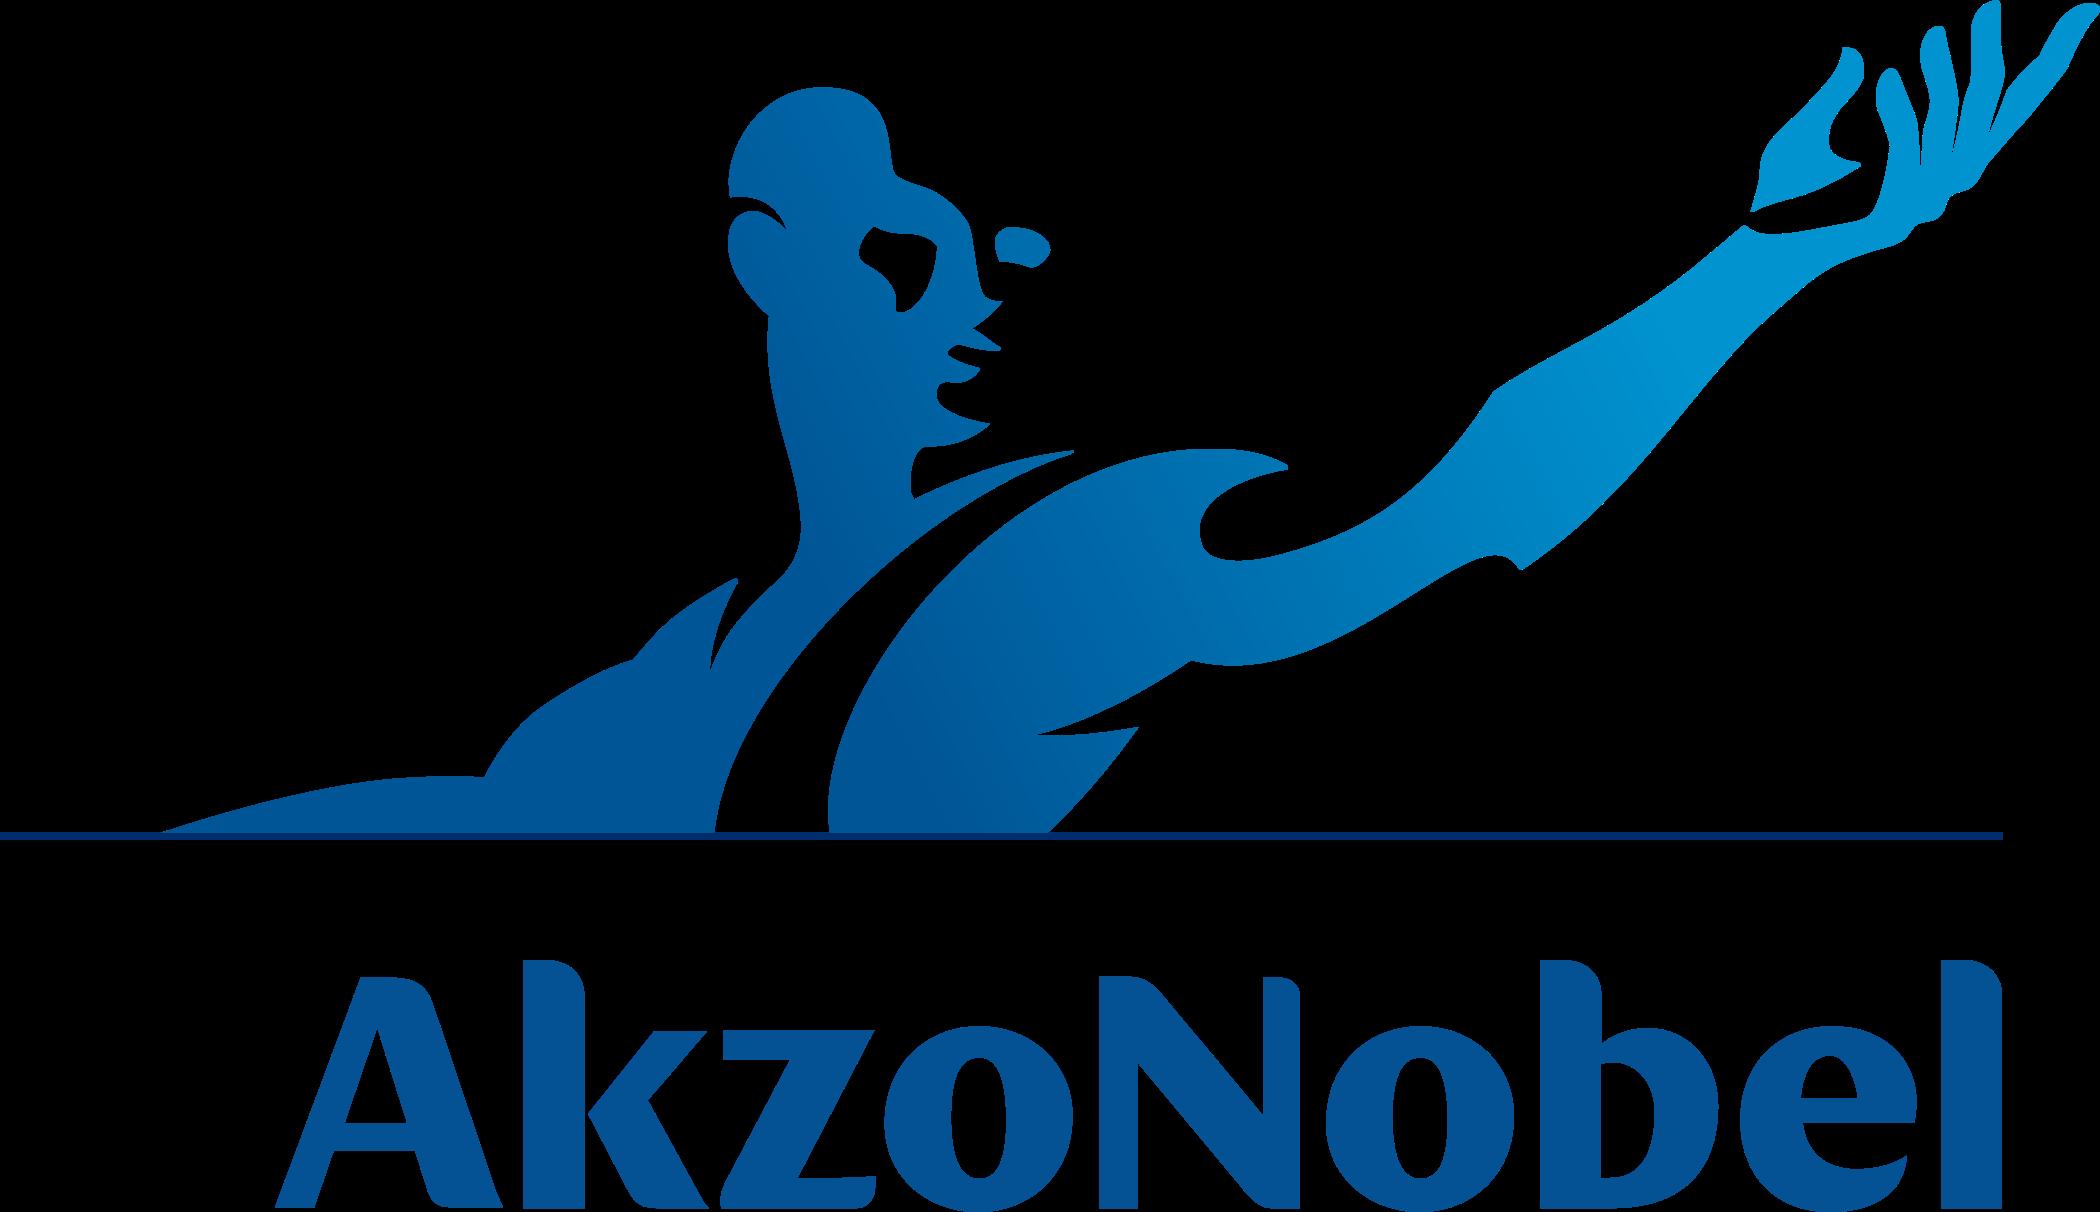 akzo nobel logo 3 - AkzoNobel Logo